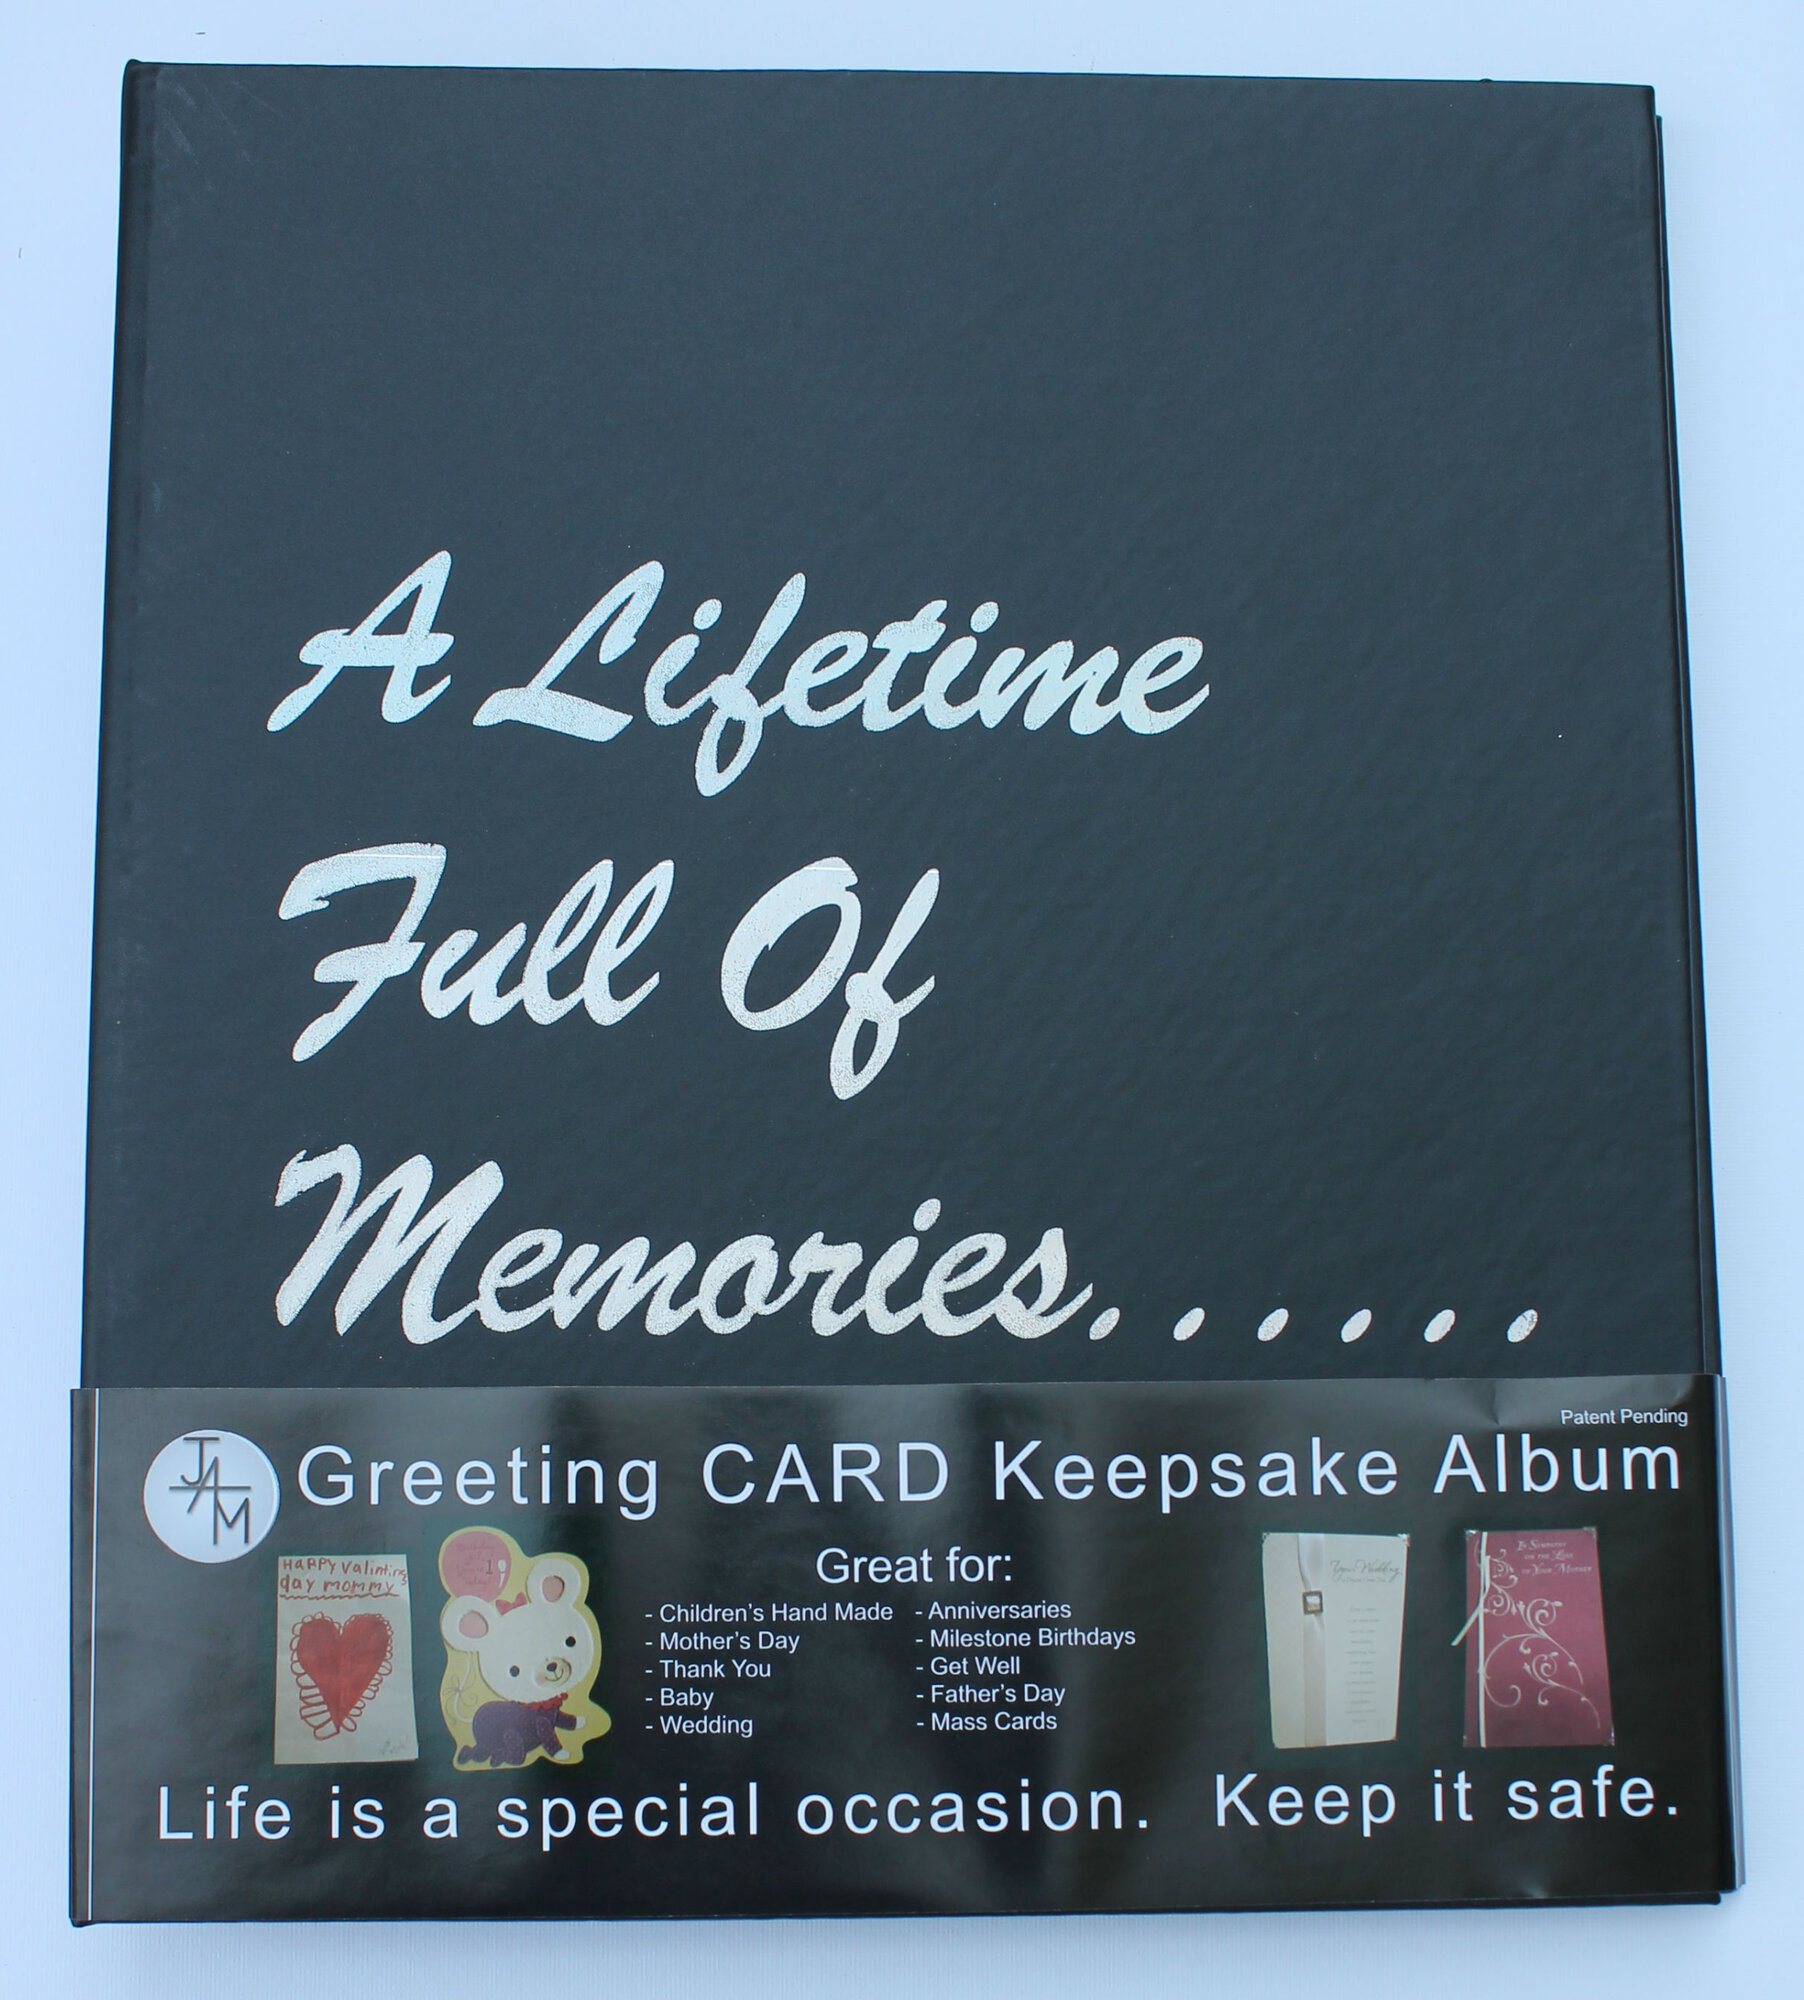 Ja marketing greeting cardkeepsake album 893803002049 ebay ja marketing greeting cardkeepsake album our sku adsa1018 mpn 4 m4hsunfo